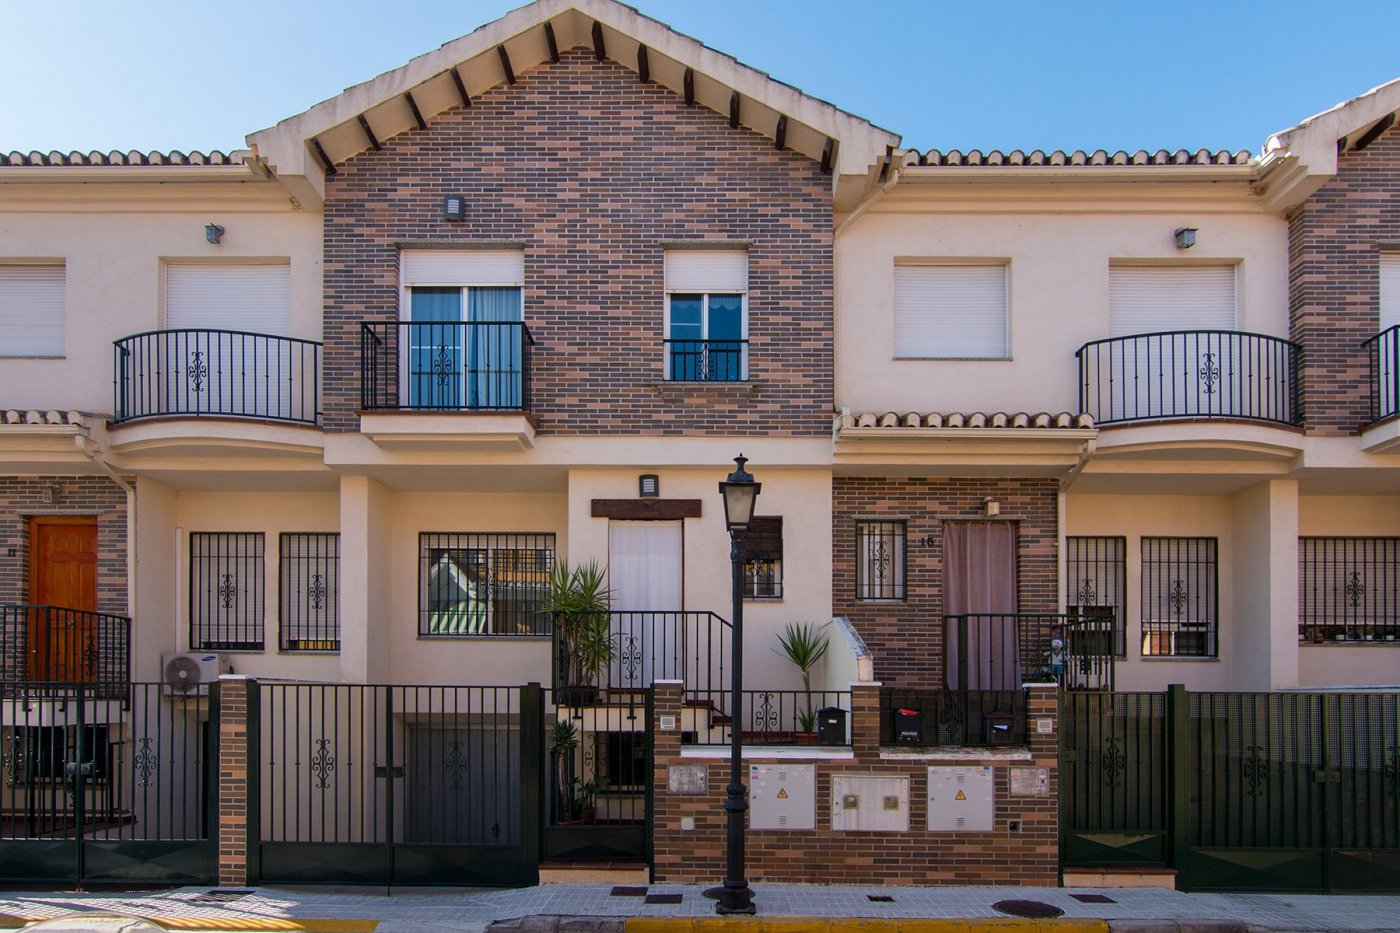 Casa adosada, Peligros, Granada